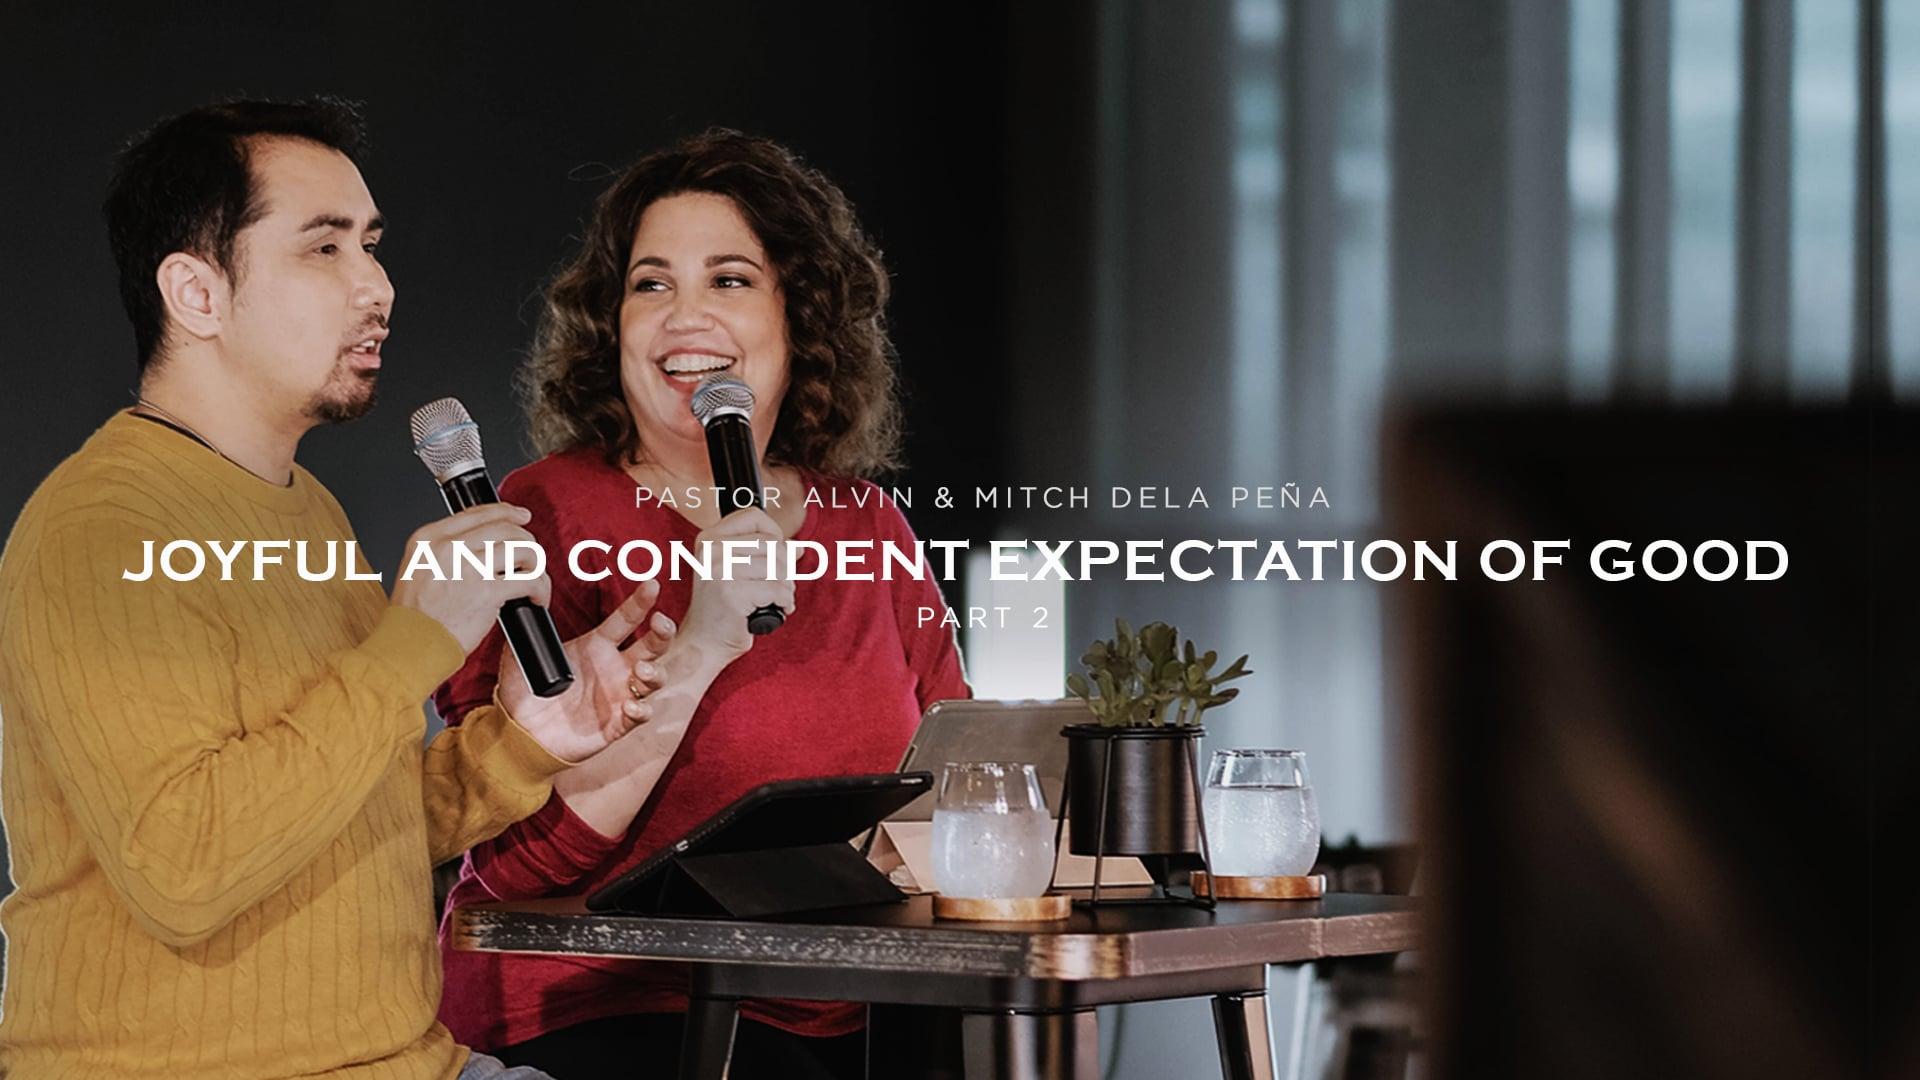 Joyful And Confident Expectation Of Good - 2